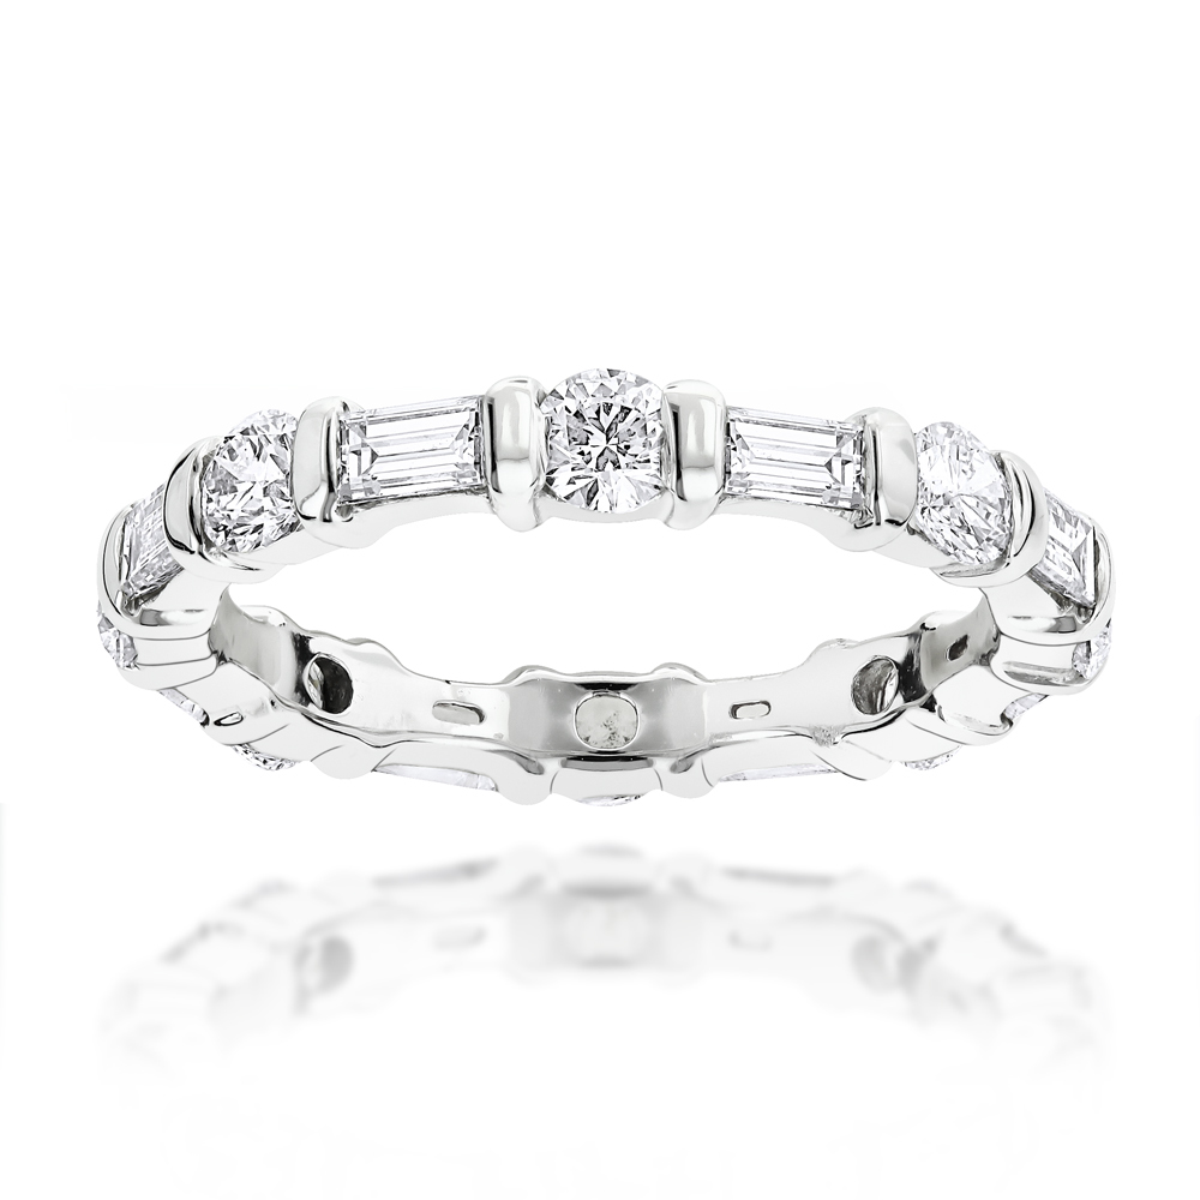 Price Of  Carat Diamond Ring